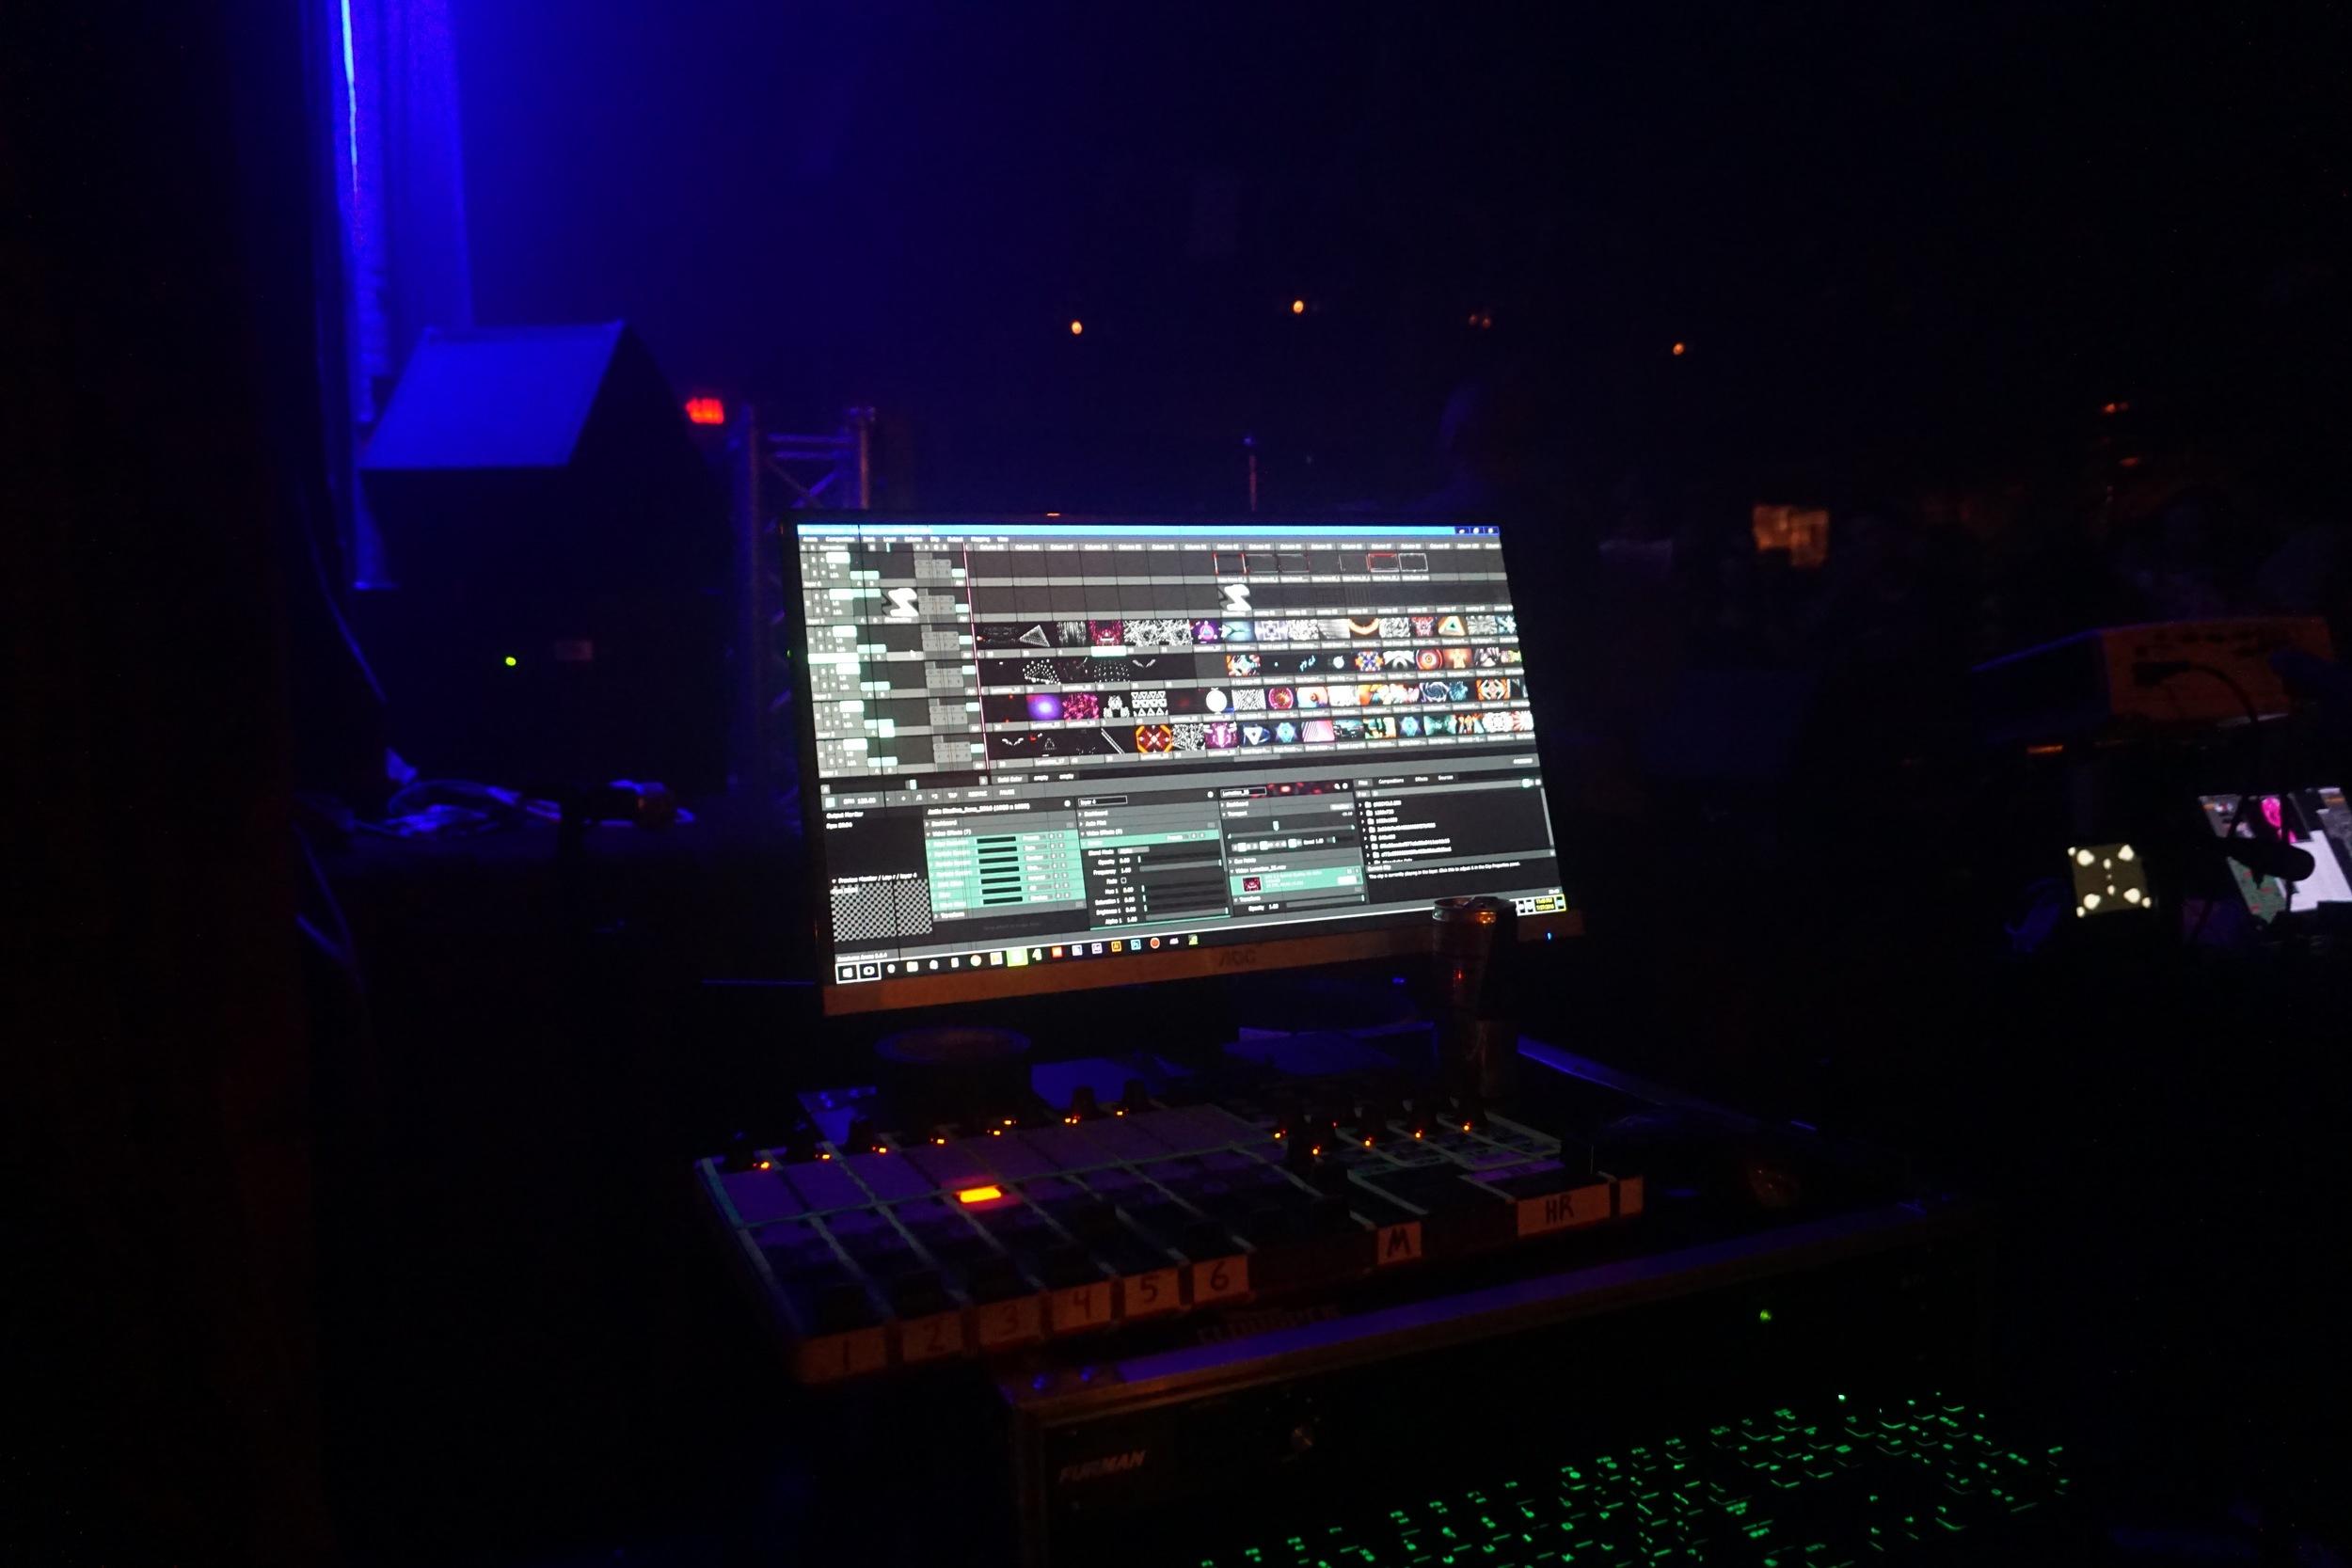 Visuals and LED lights from Minneapolis company Playata.